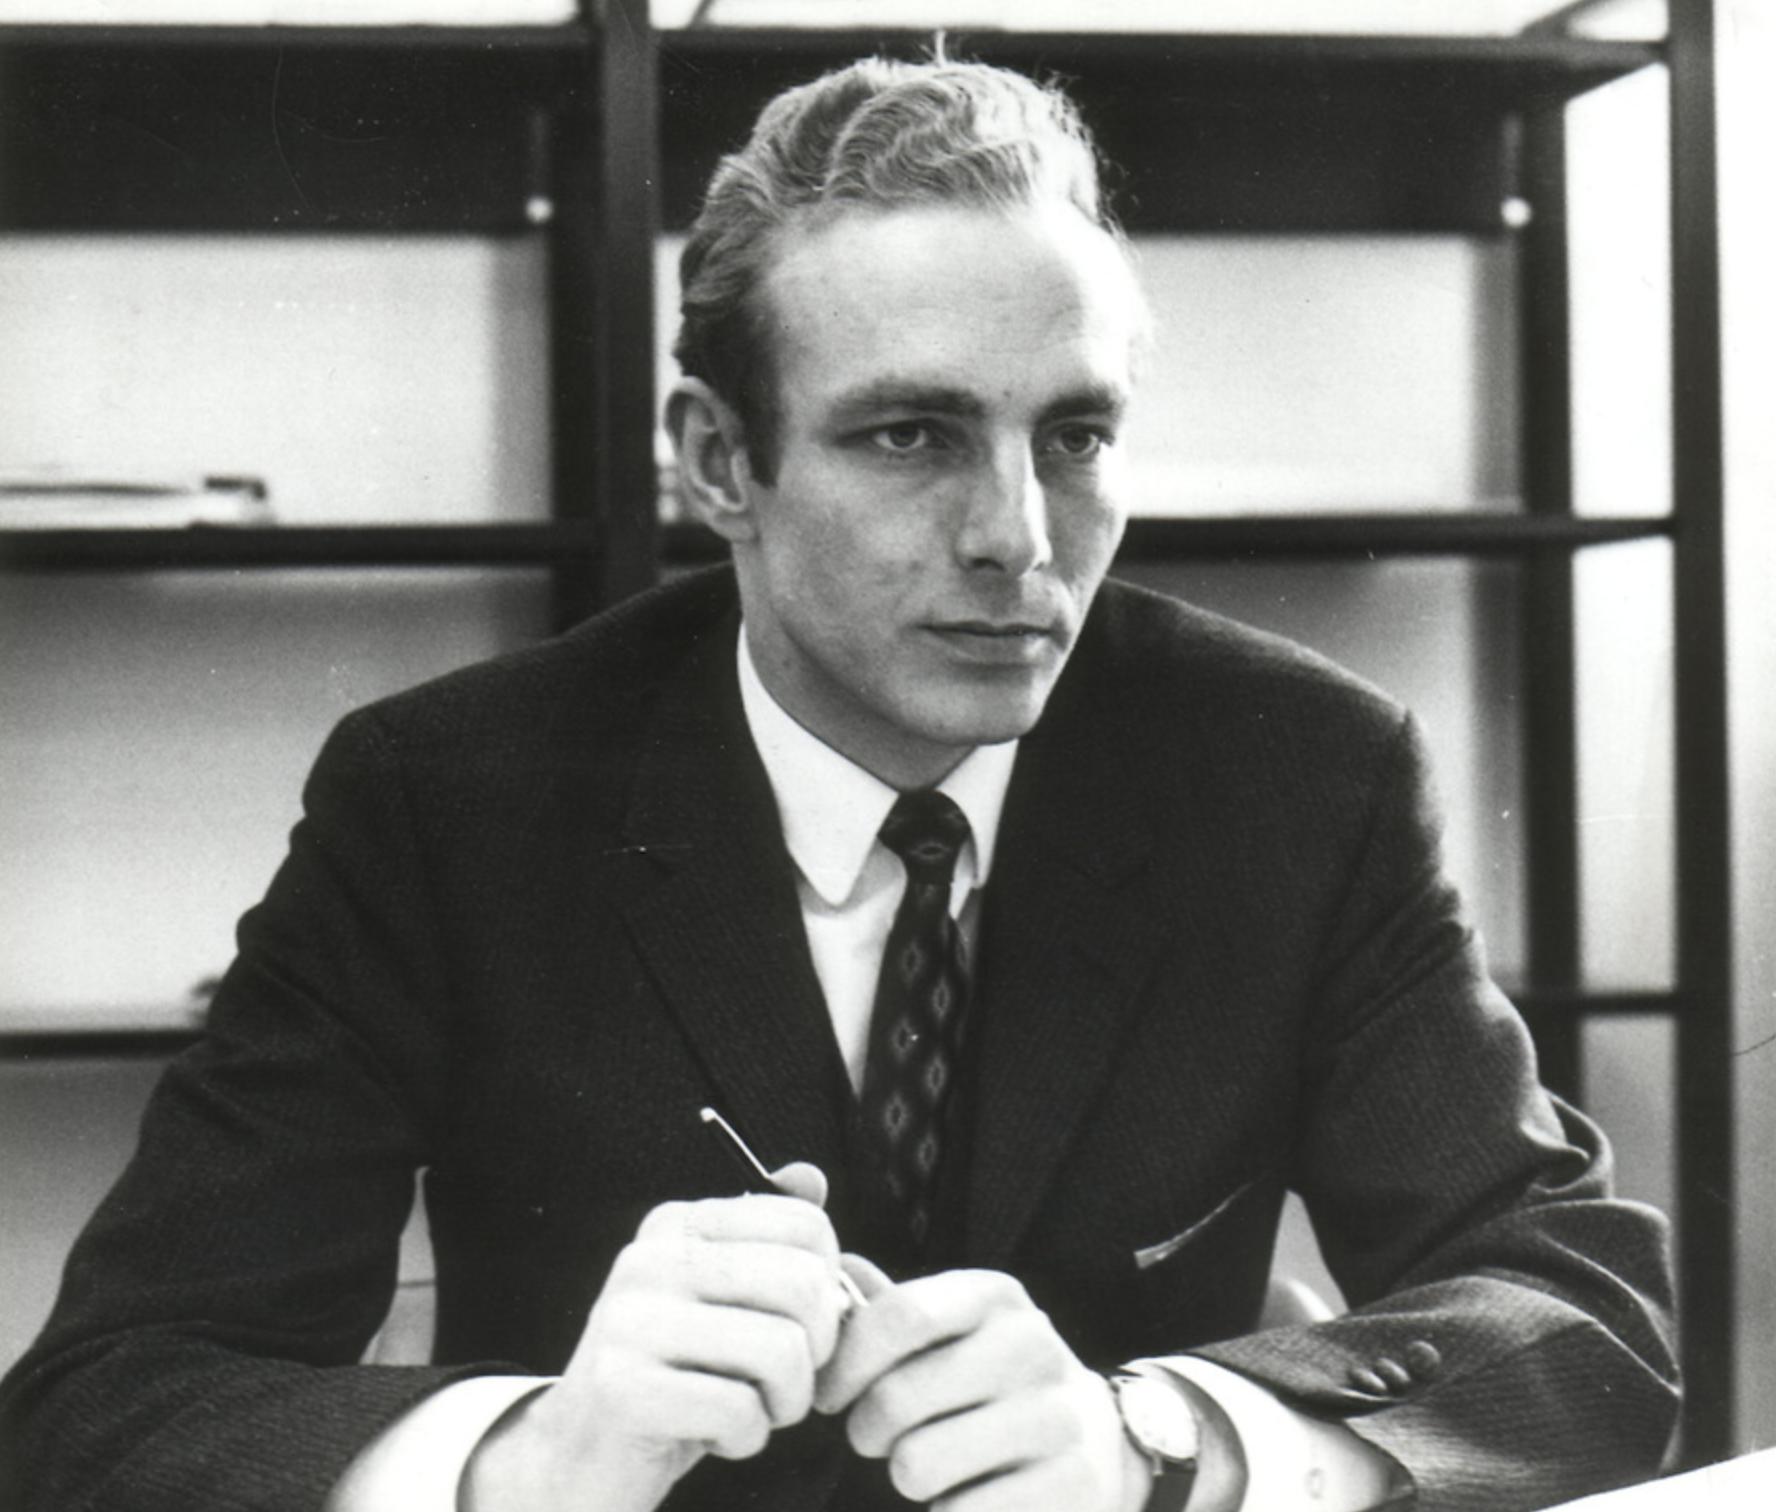 A young and ambitious Pekka Koskenkyla at his desk